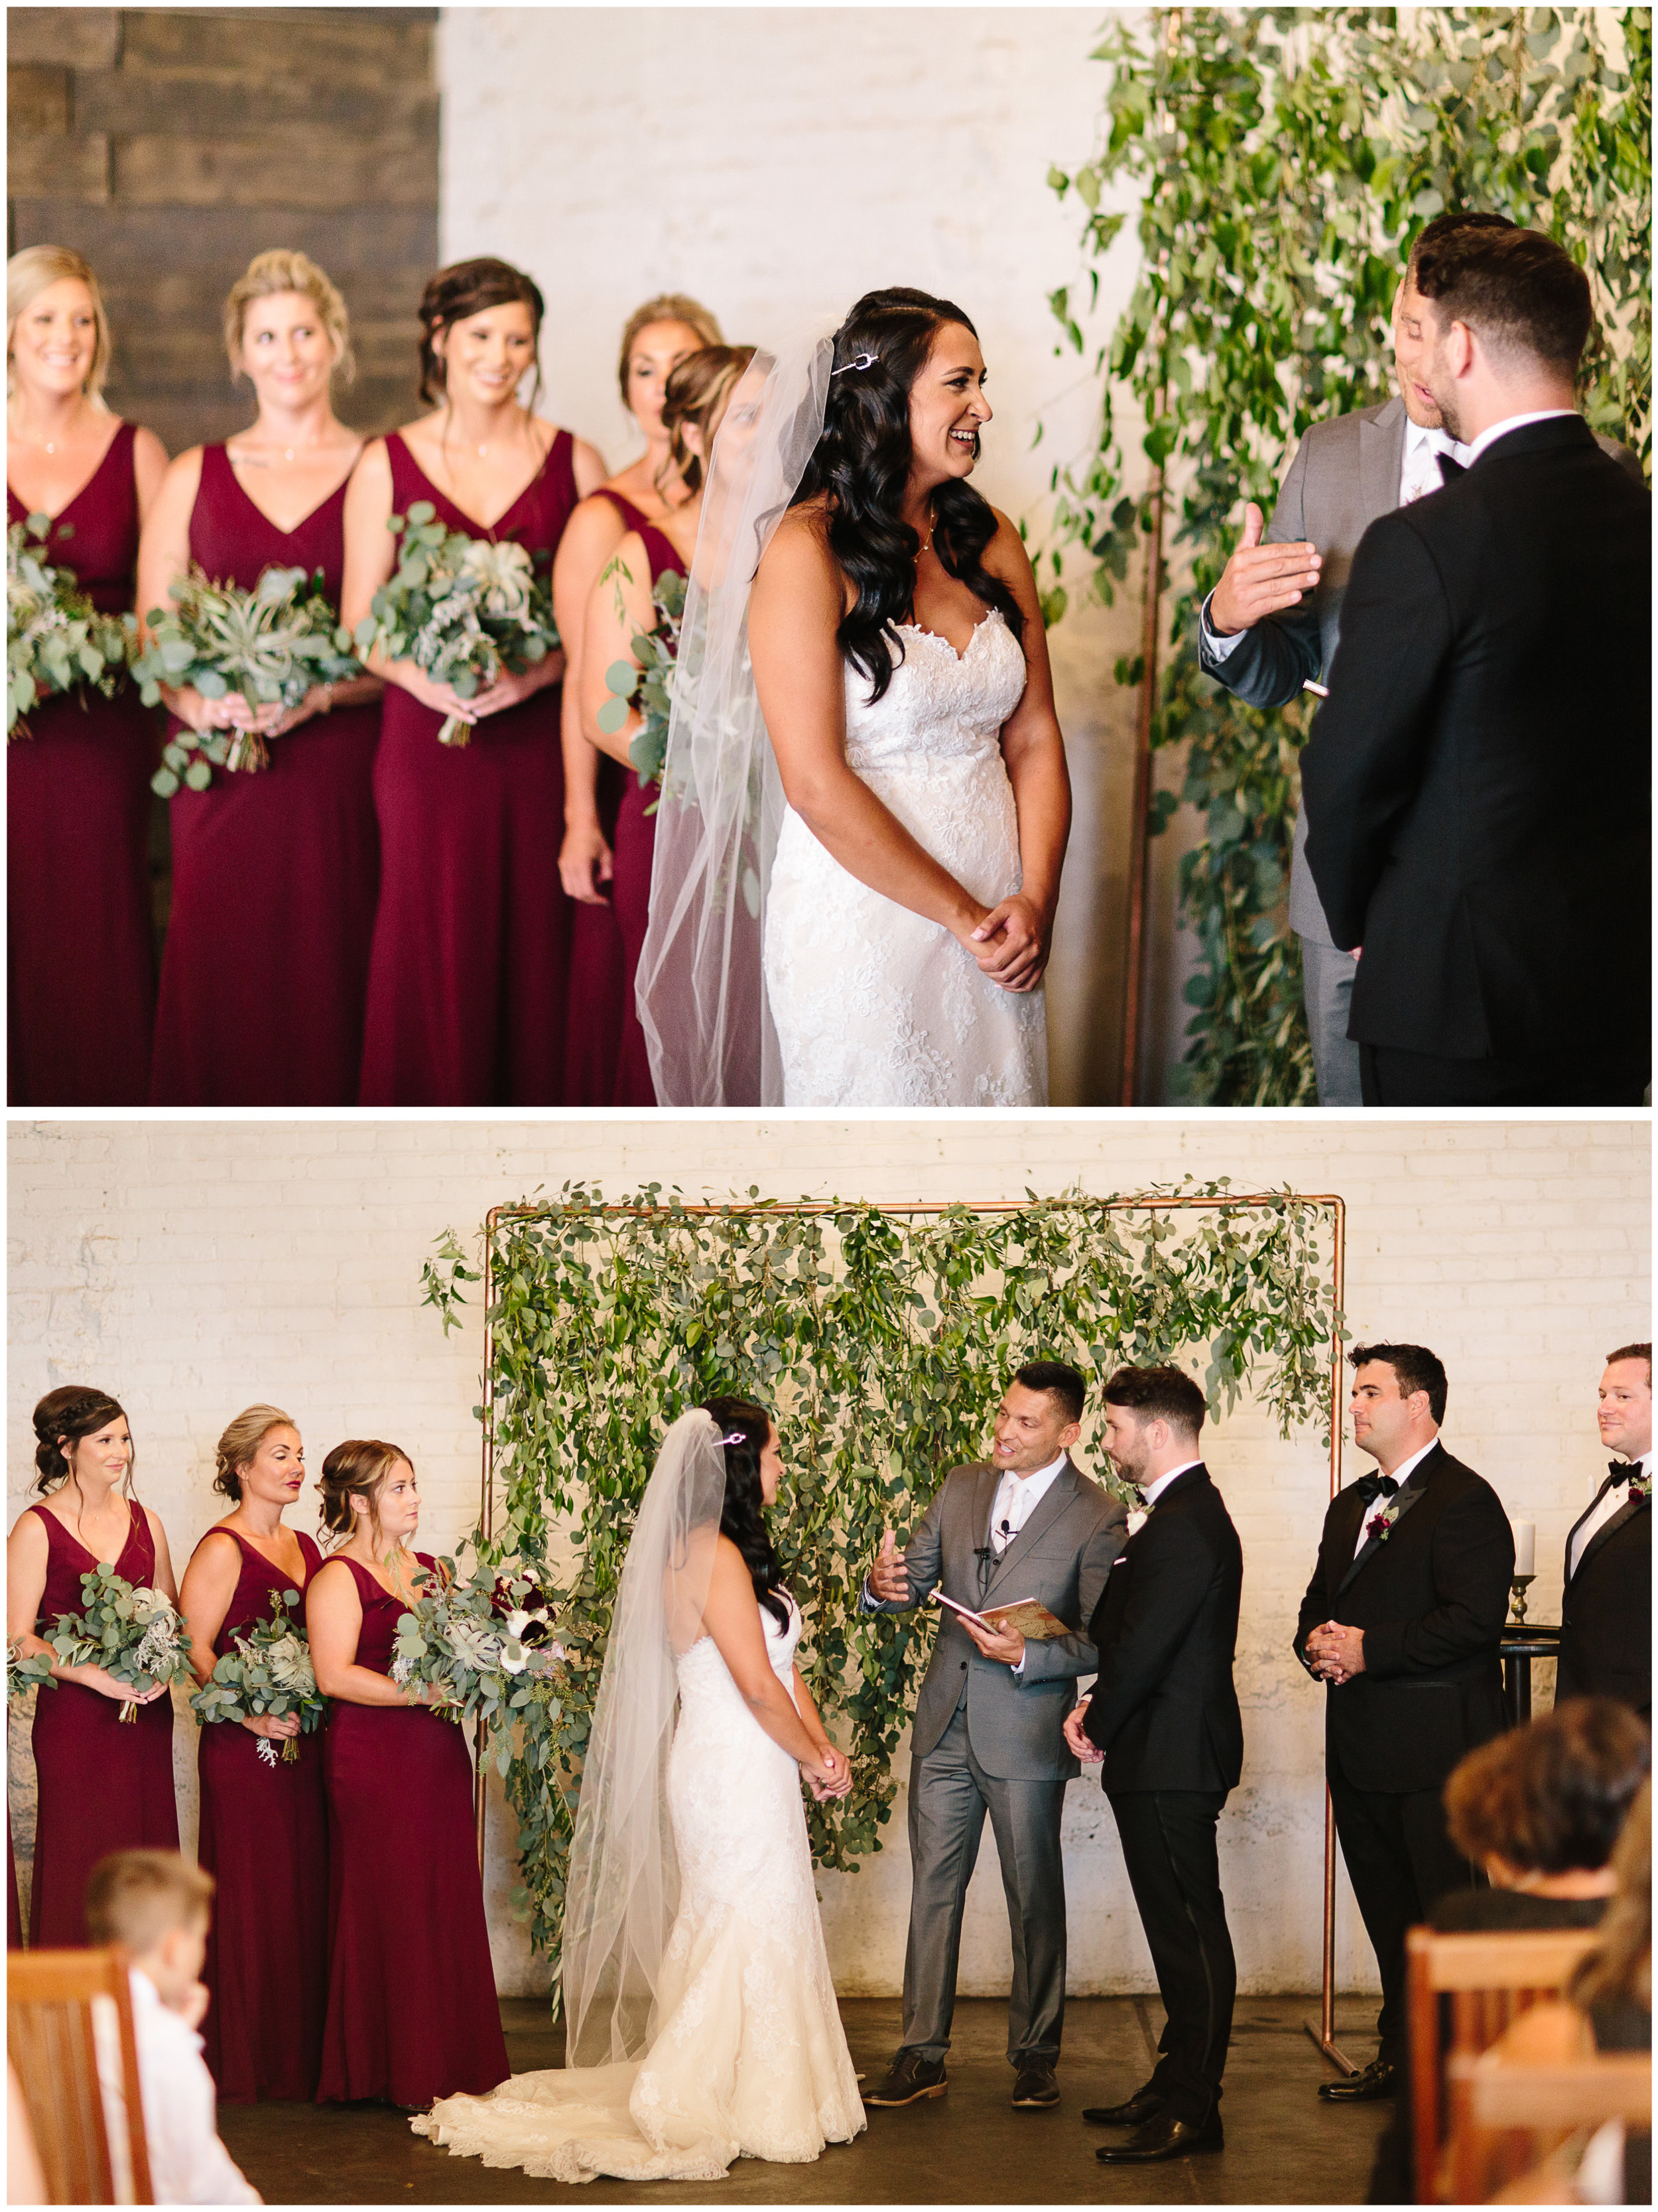 moss_denver_wedding_50.jpg